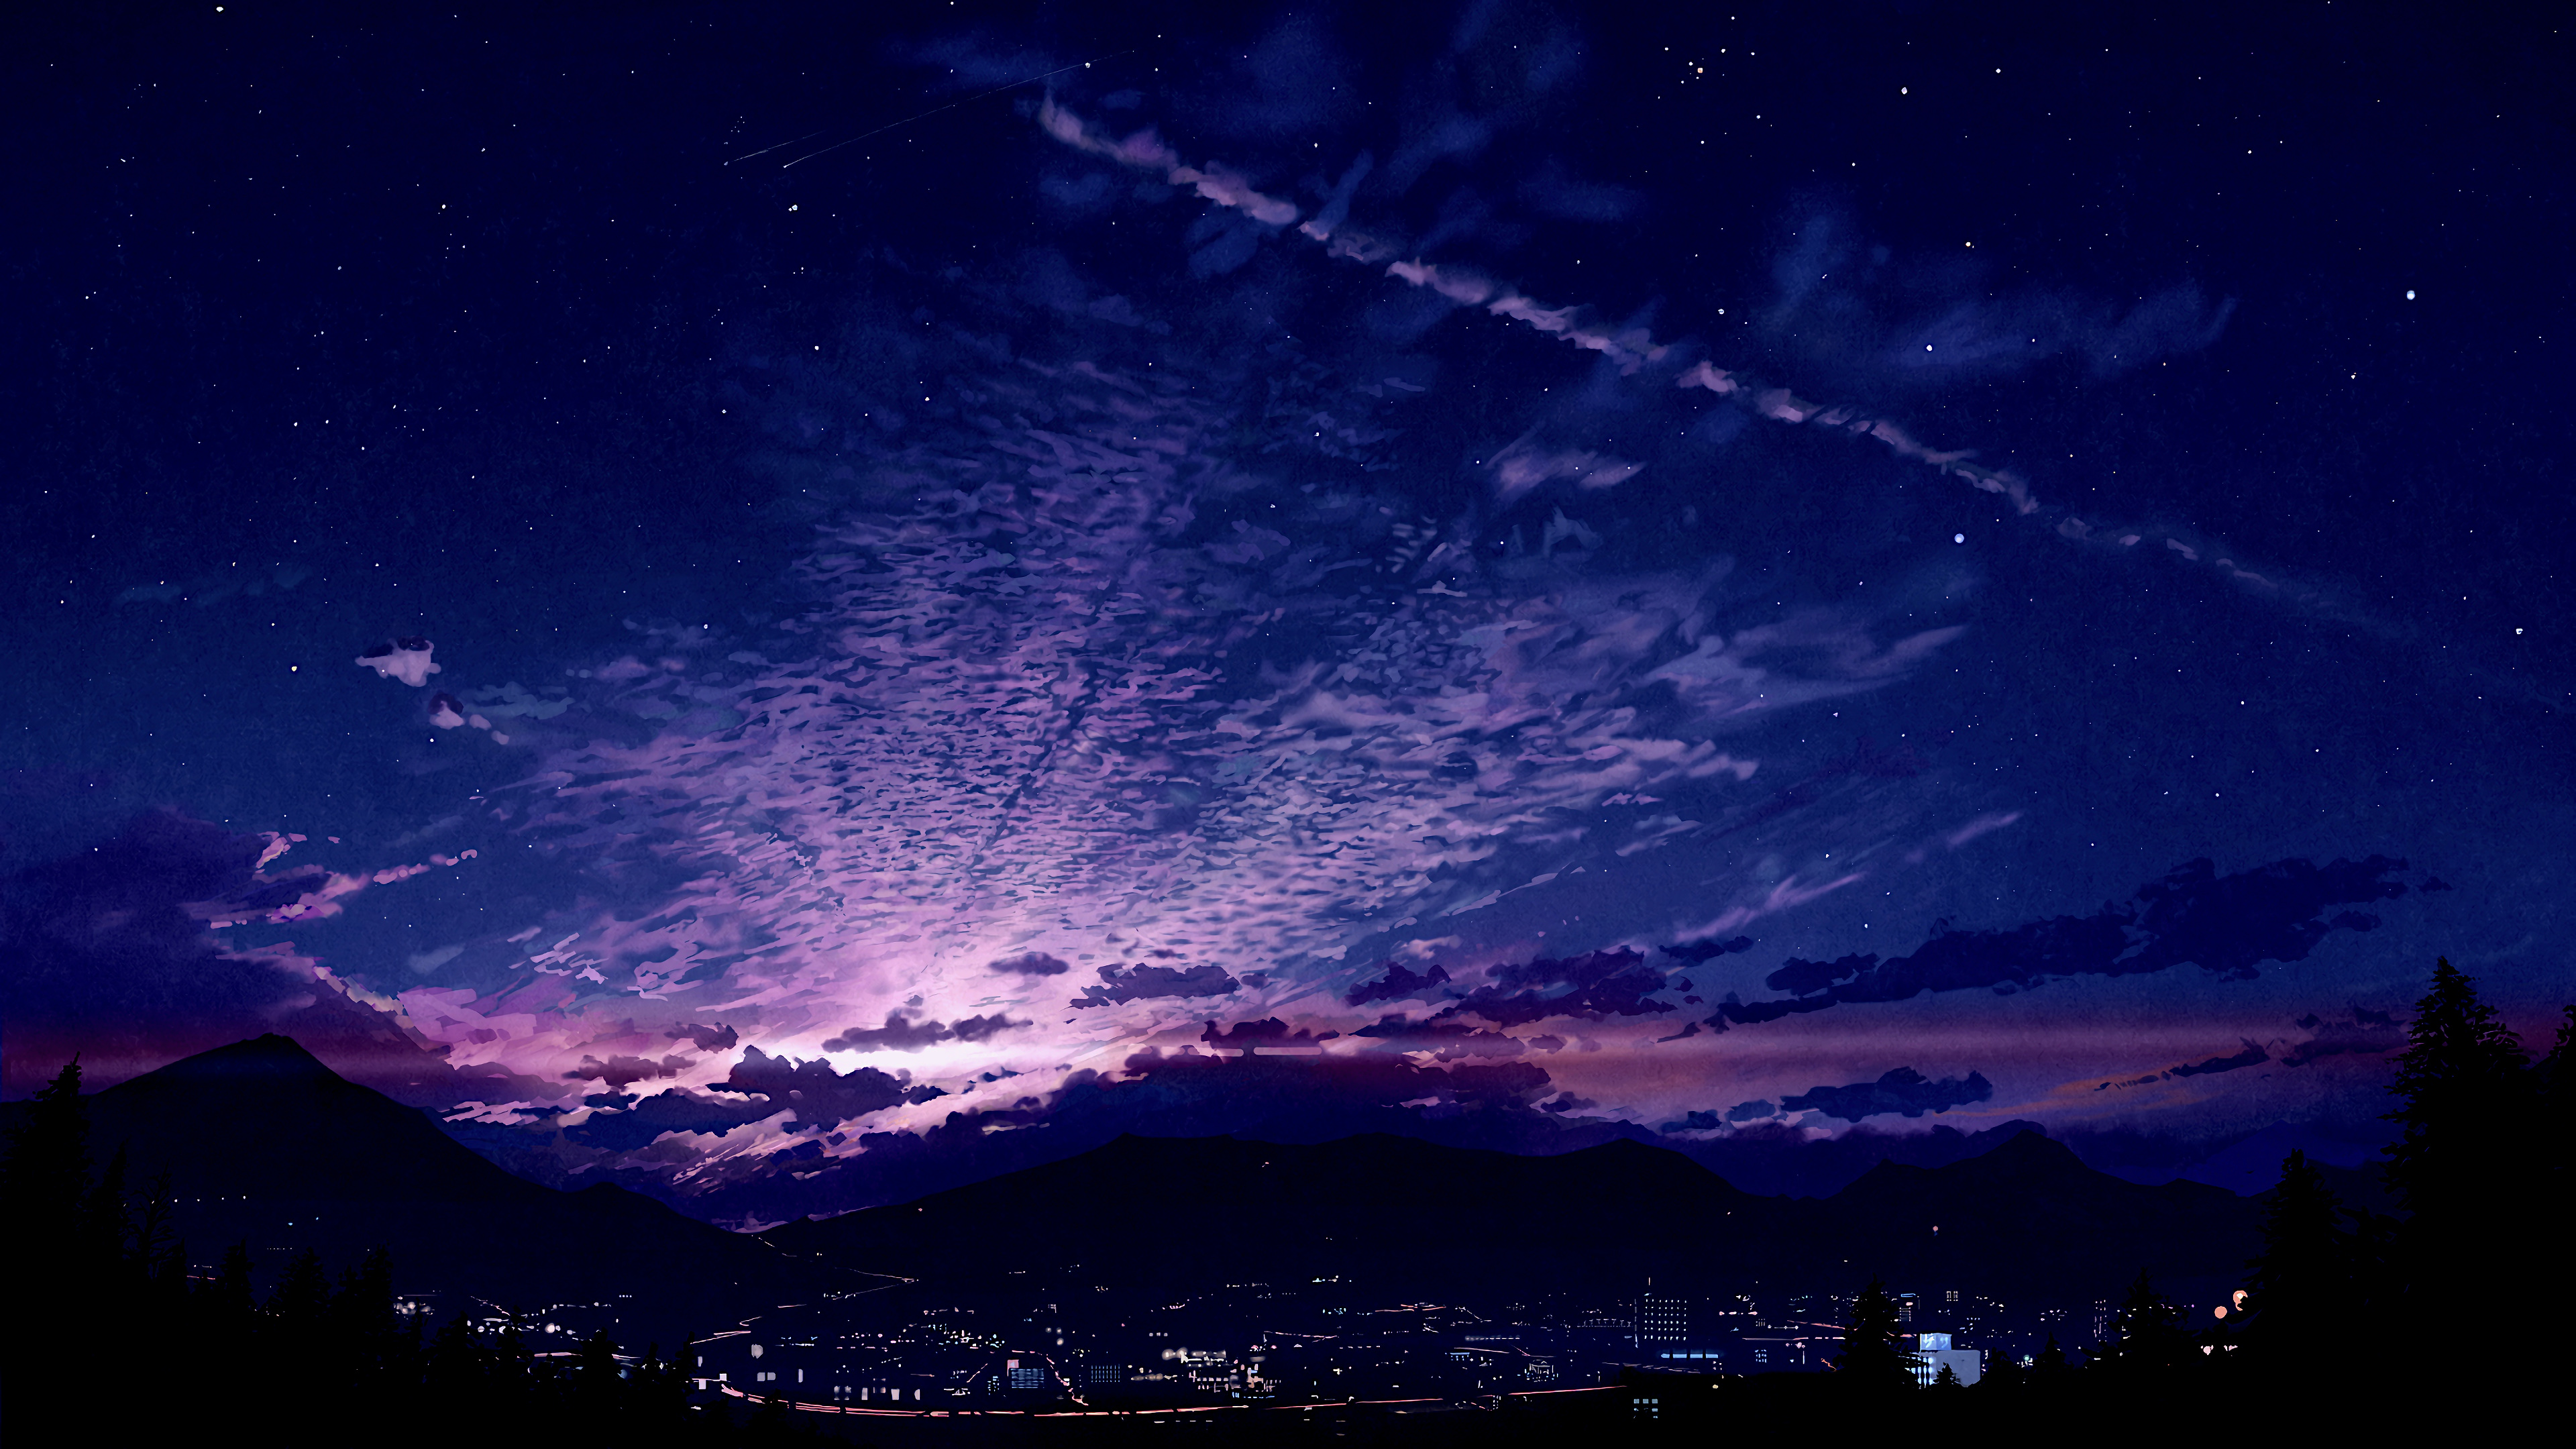 Sunrise City Sky Scenery Anime 4k Wallpaper 128